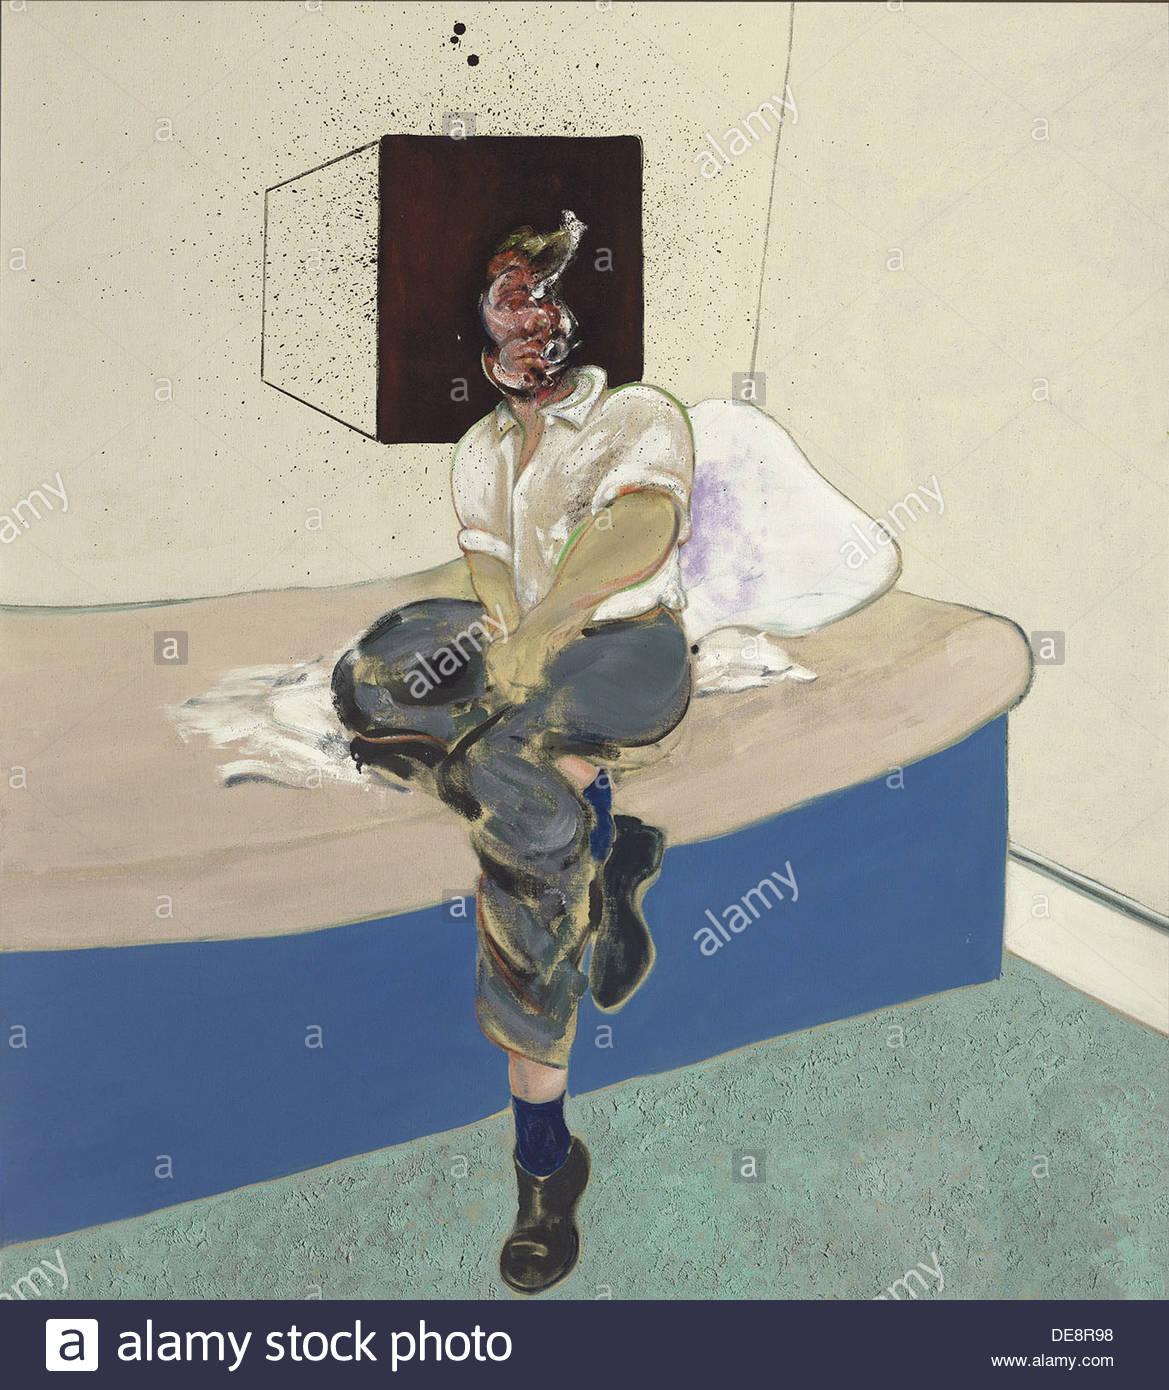 Self-Portrait (Study), 1964. Artist: Bacon, Francis (1909-1992) - Stock Image